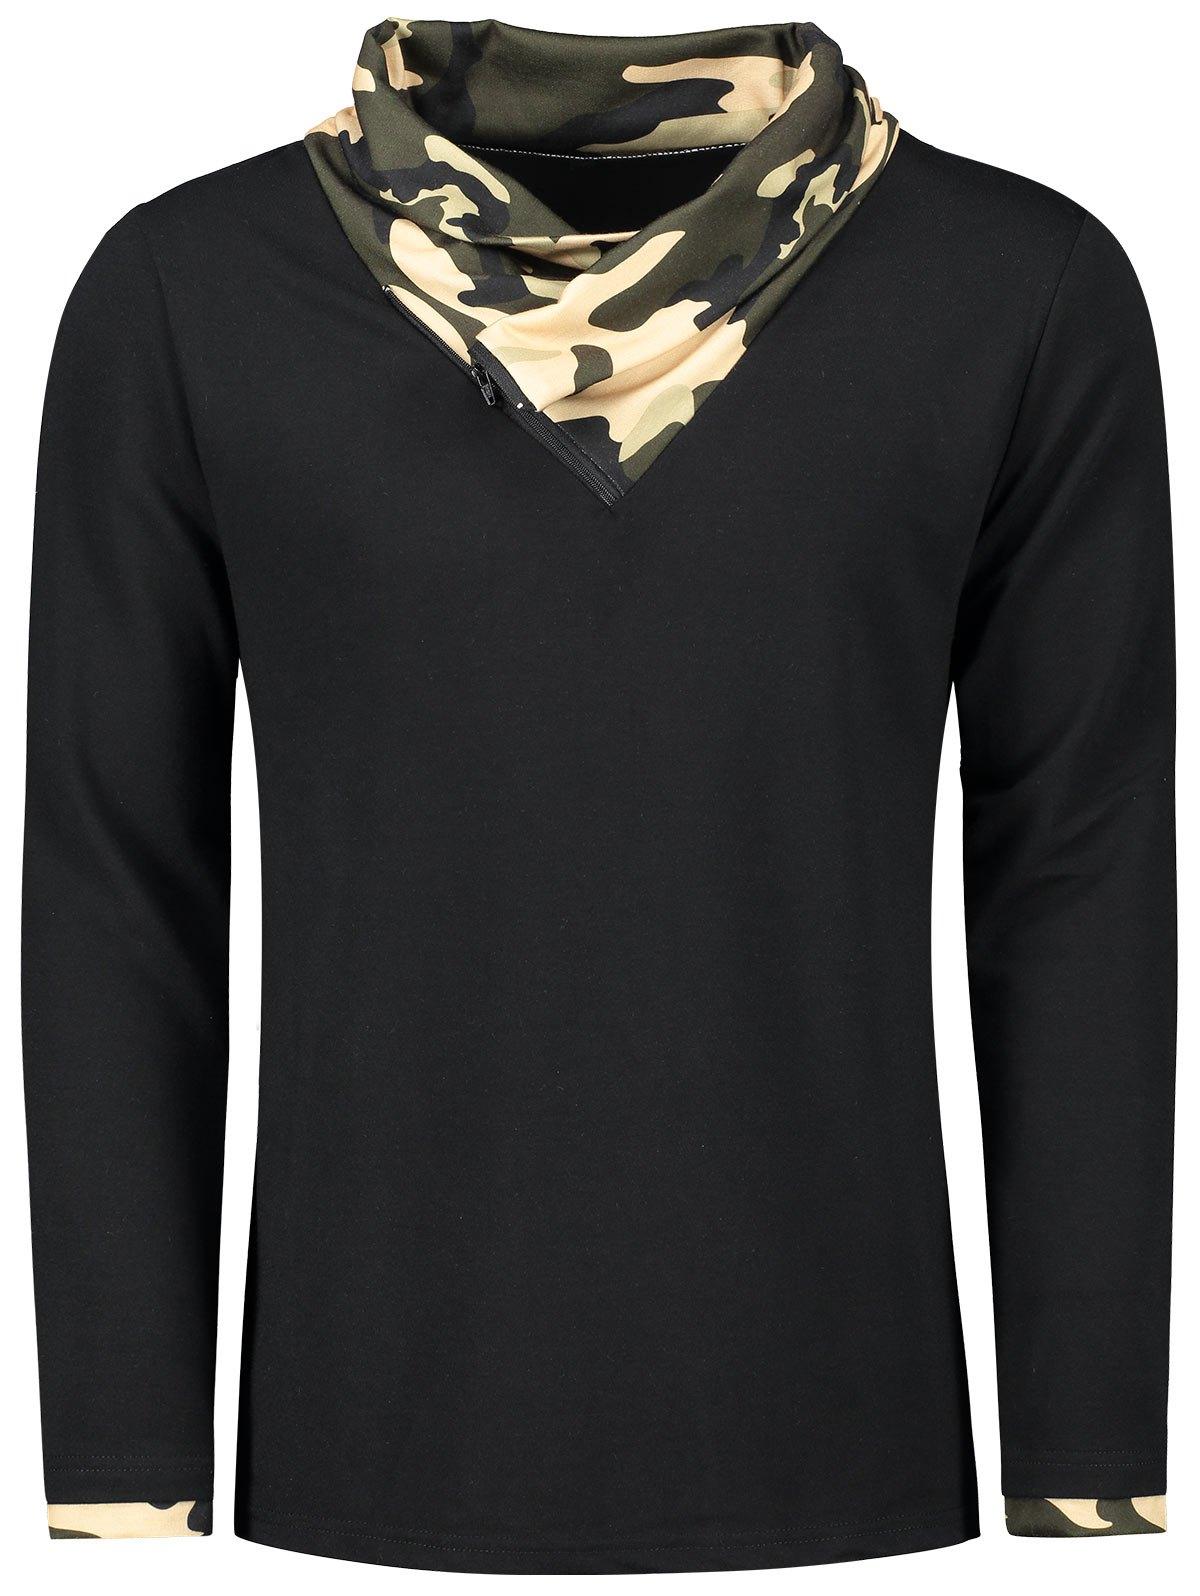 Camouflage Heaps Collar Long Sleeve T-shirt